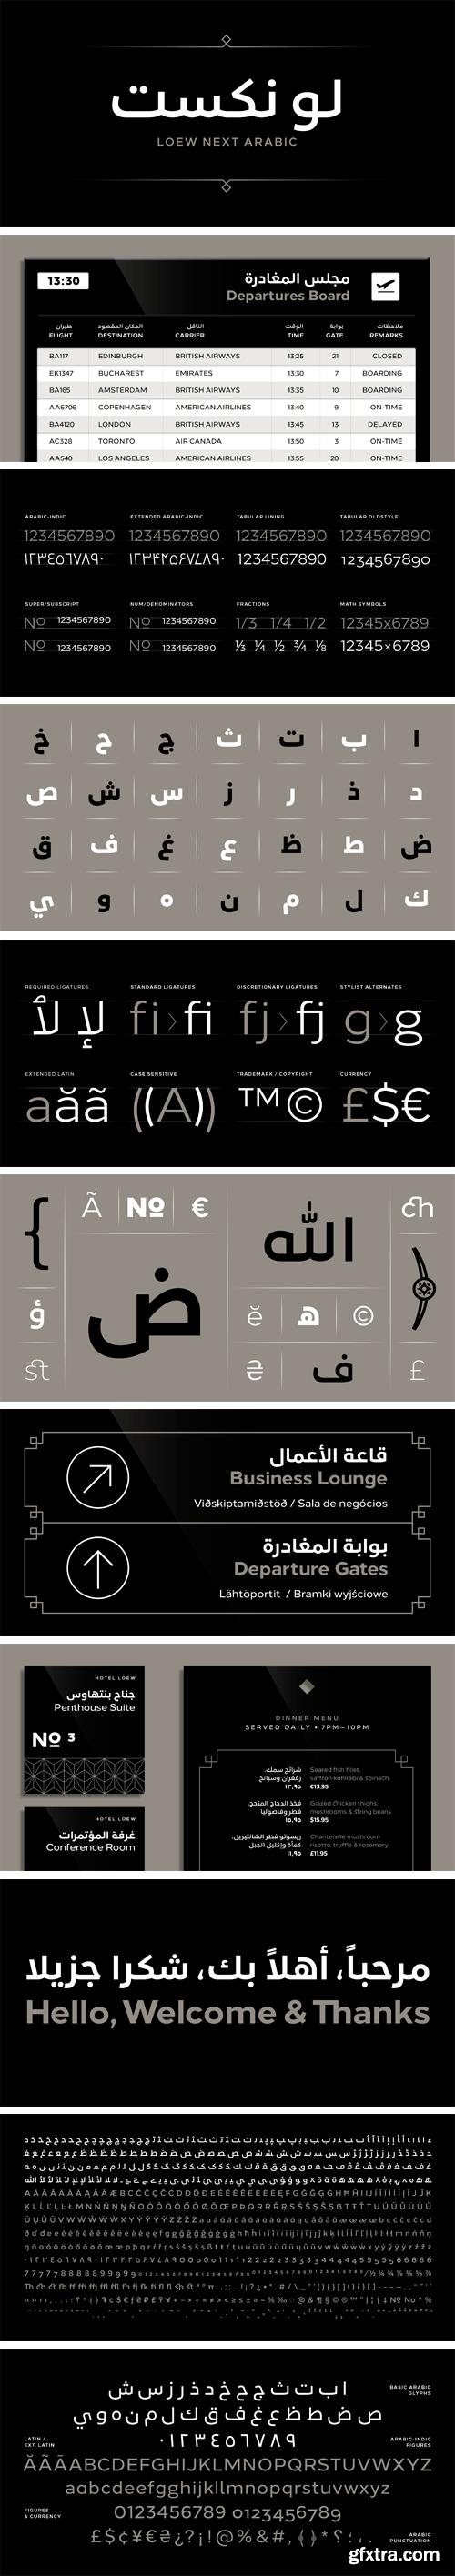 Loew Next Arabic Font Family